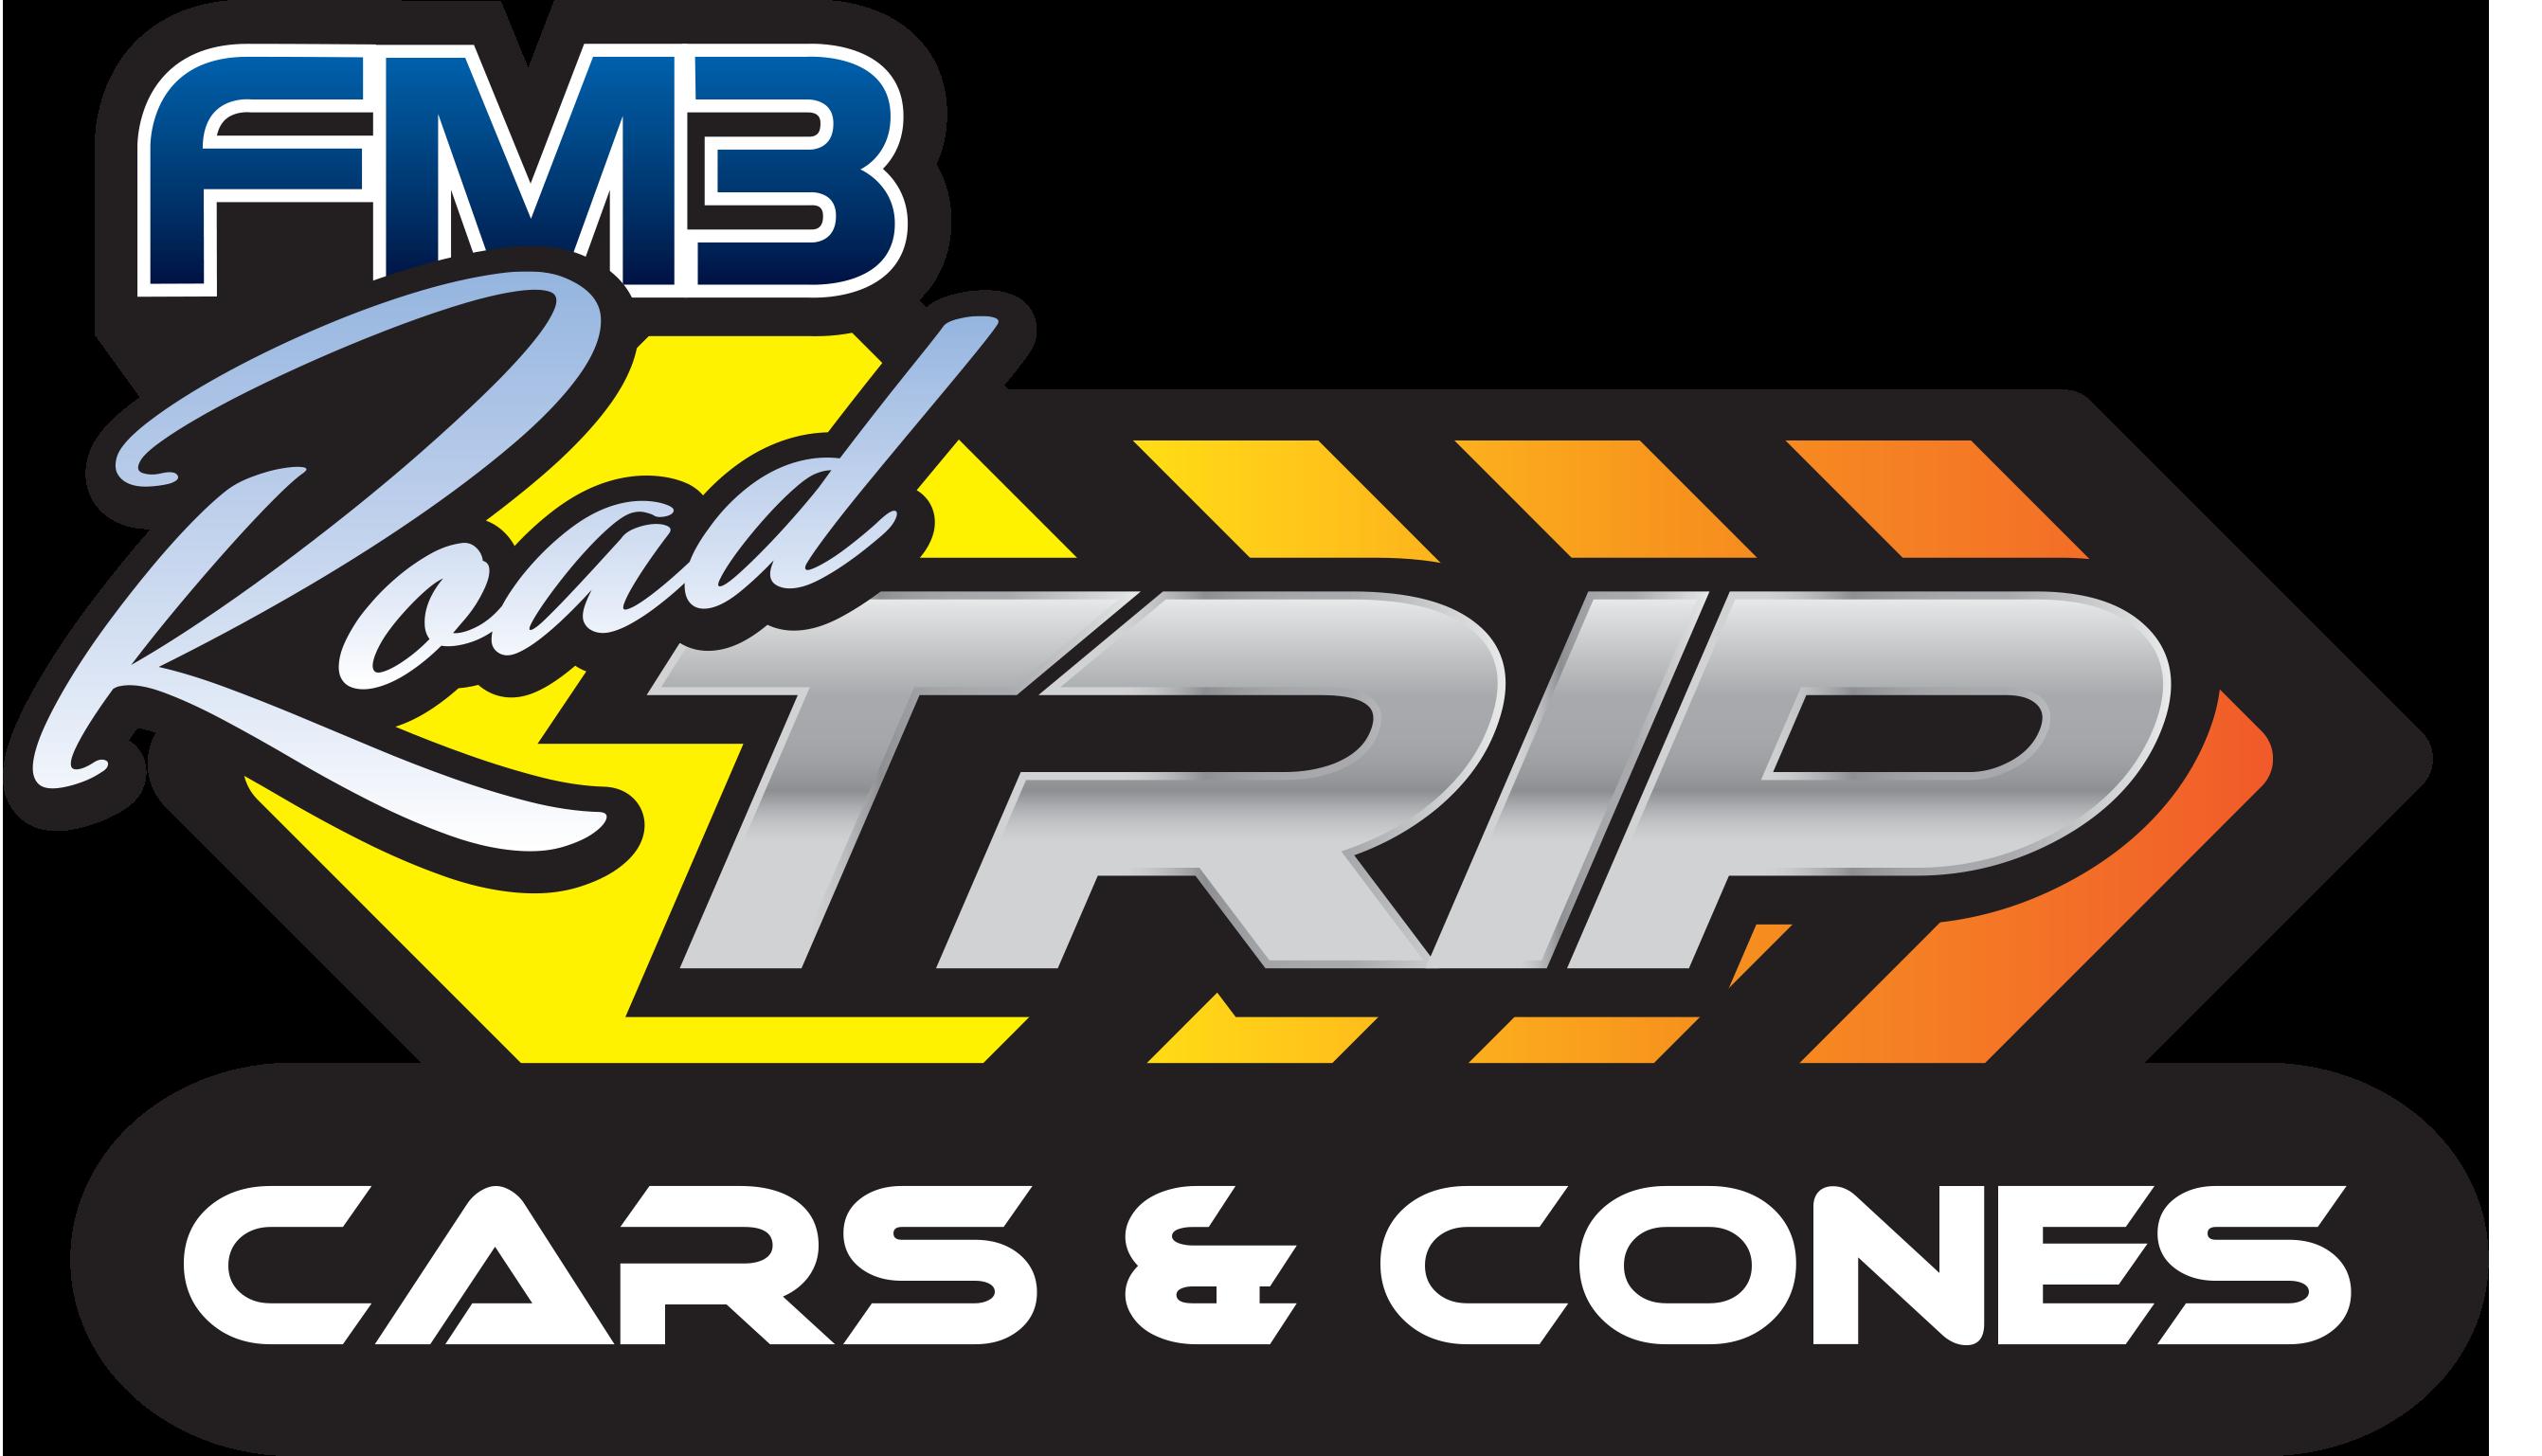 15-road-trip-logo